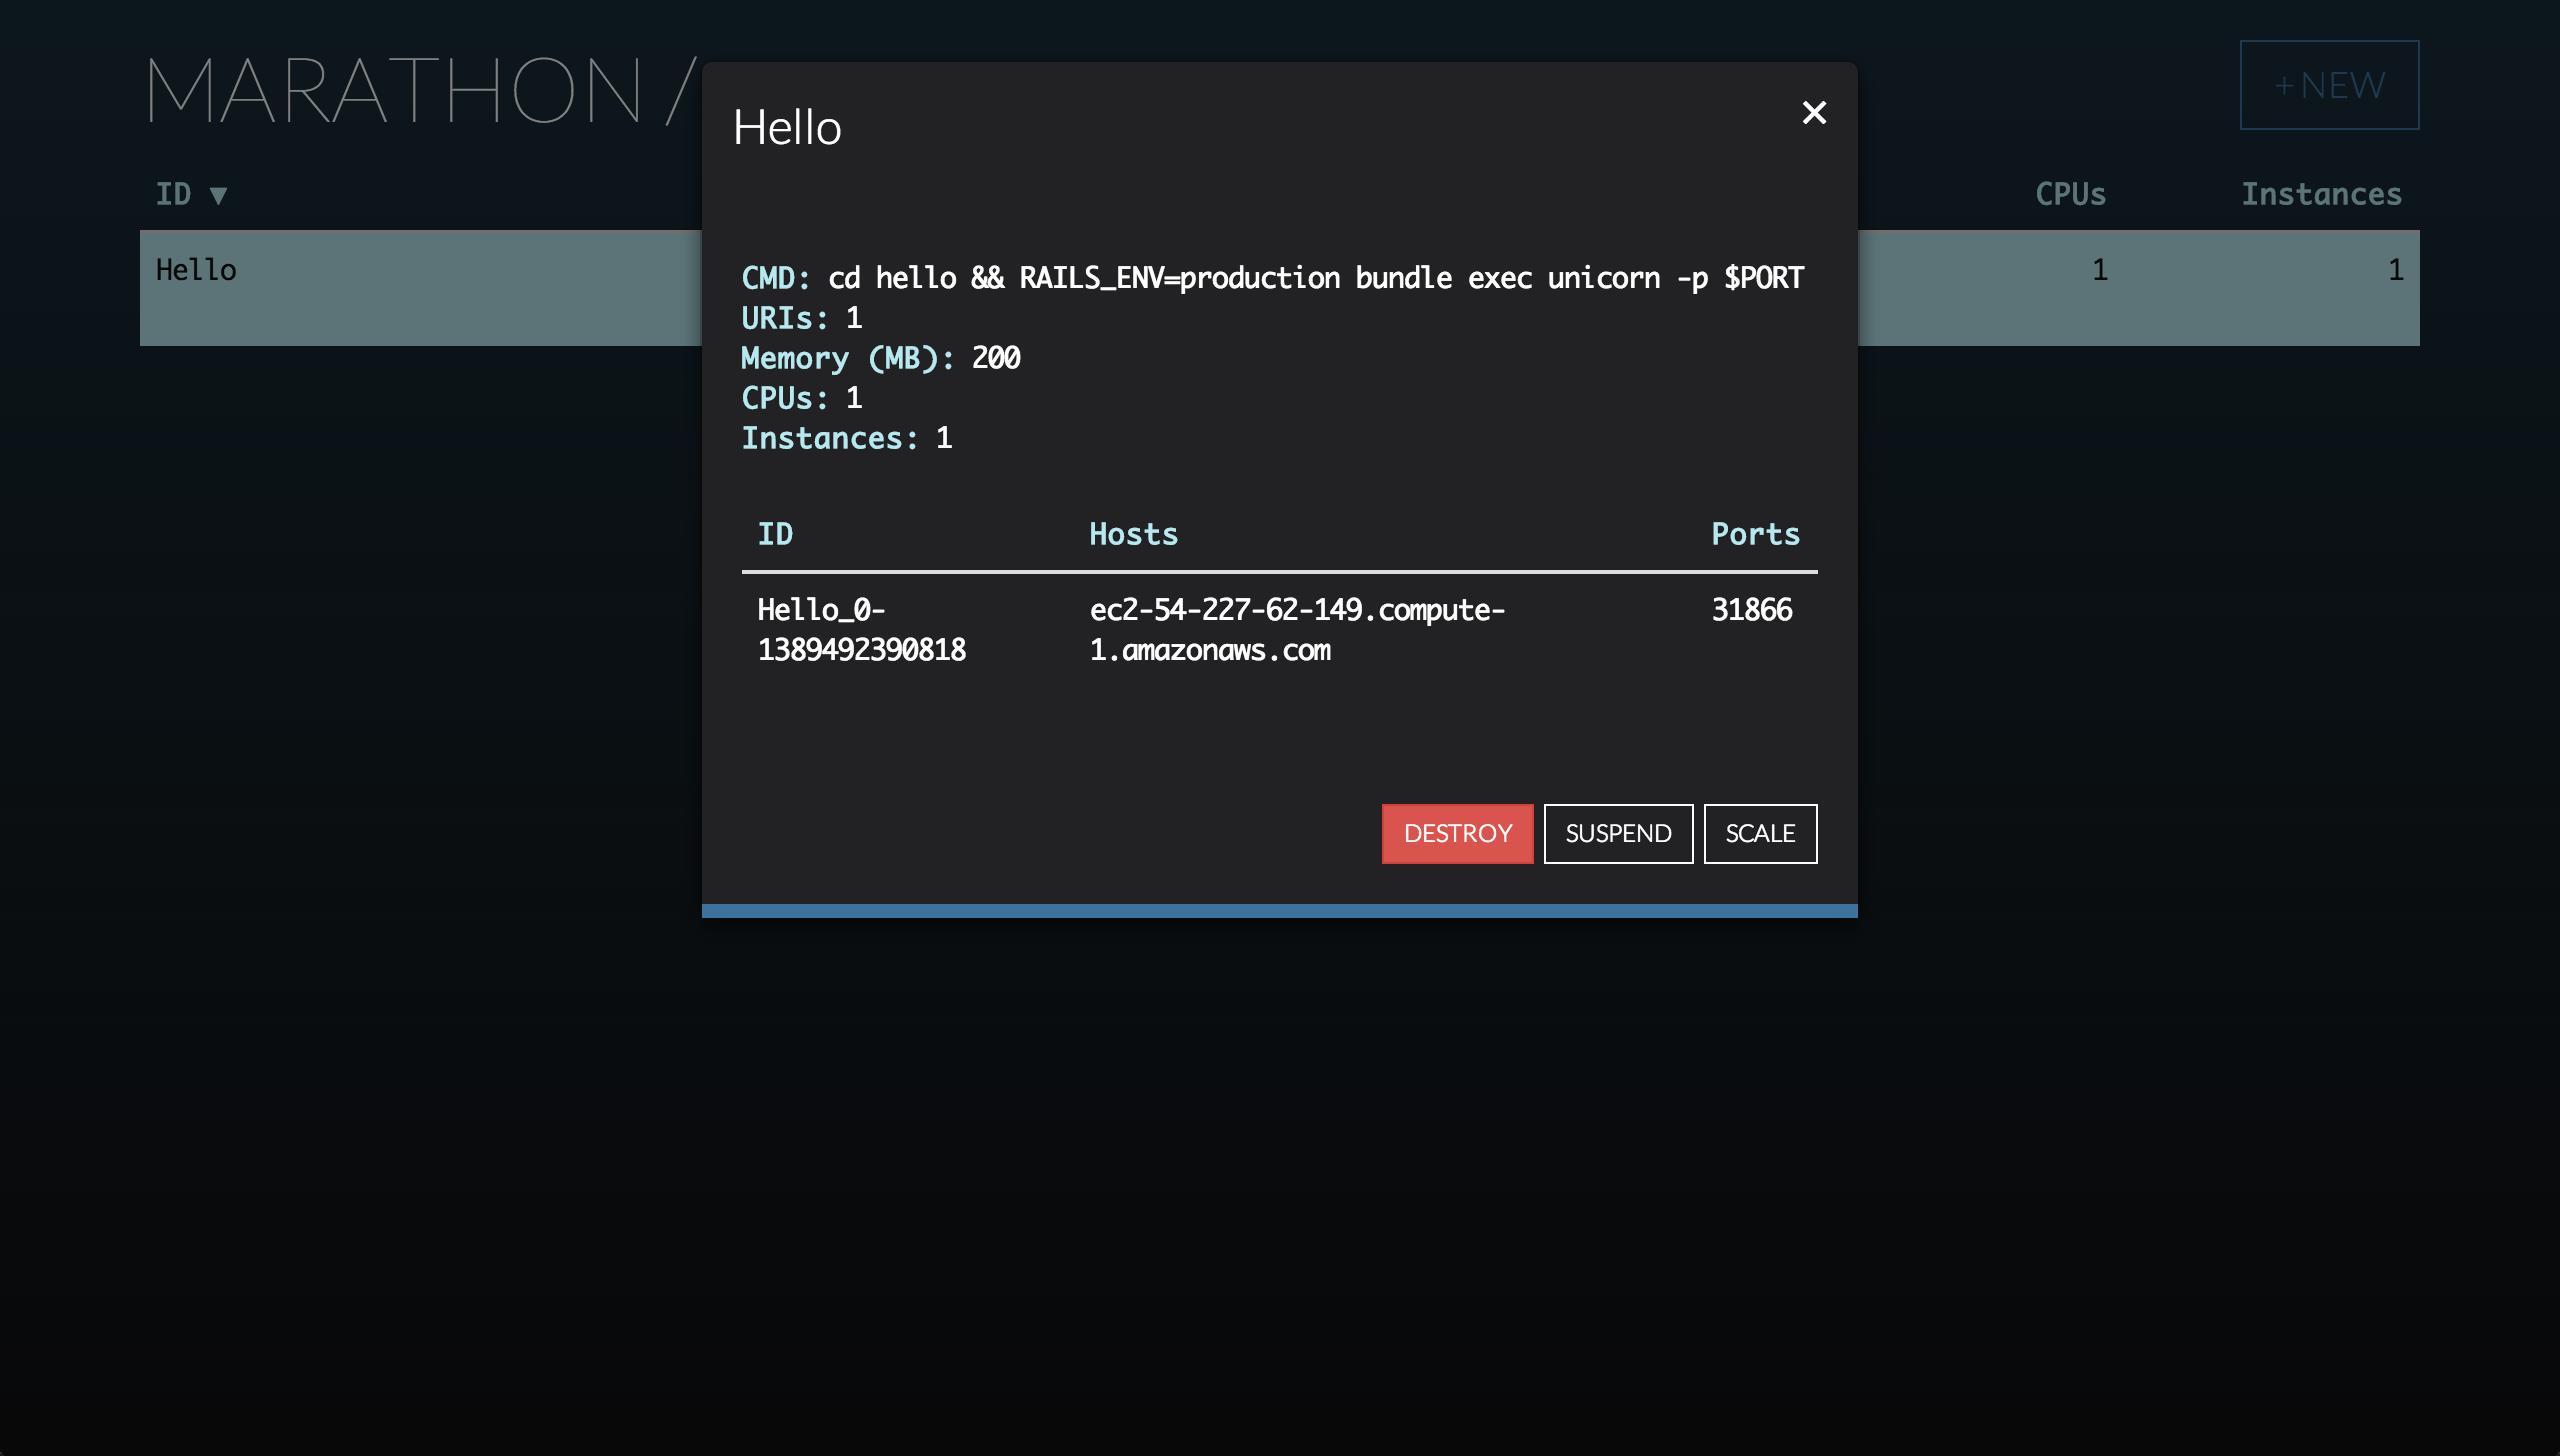 A screenshot of Rails running on Marathon.